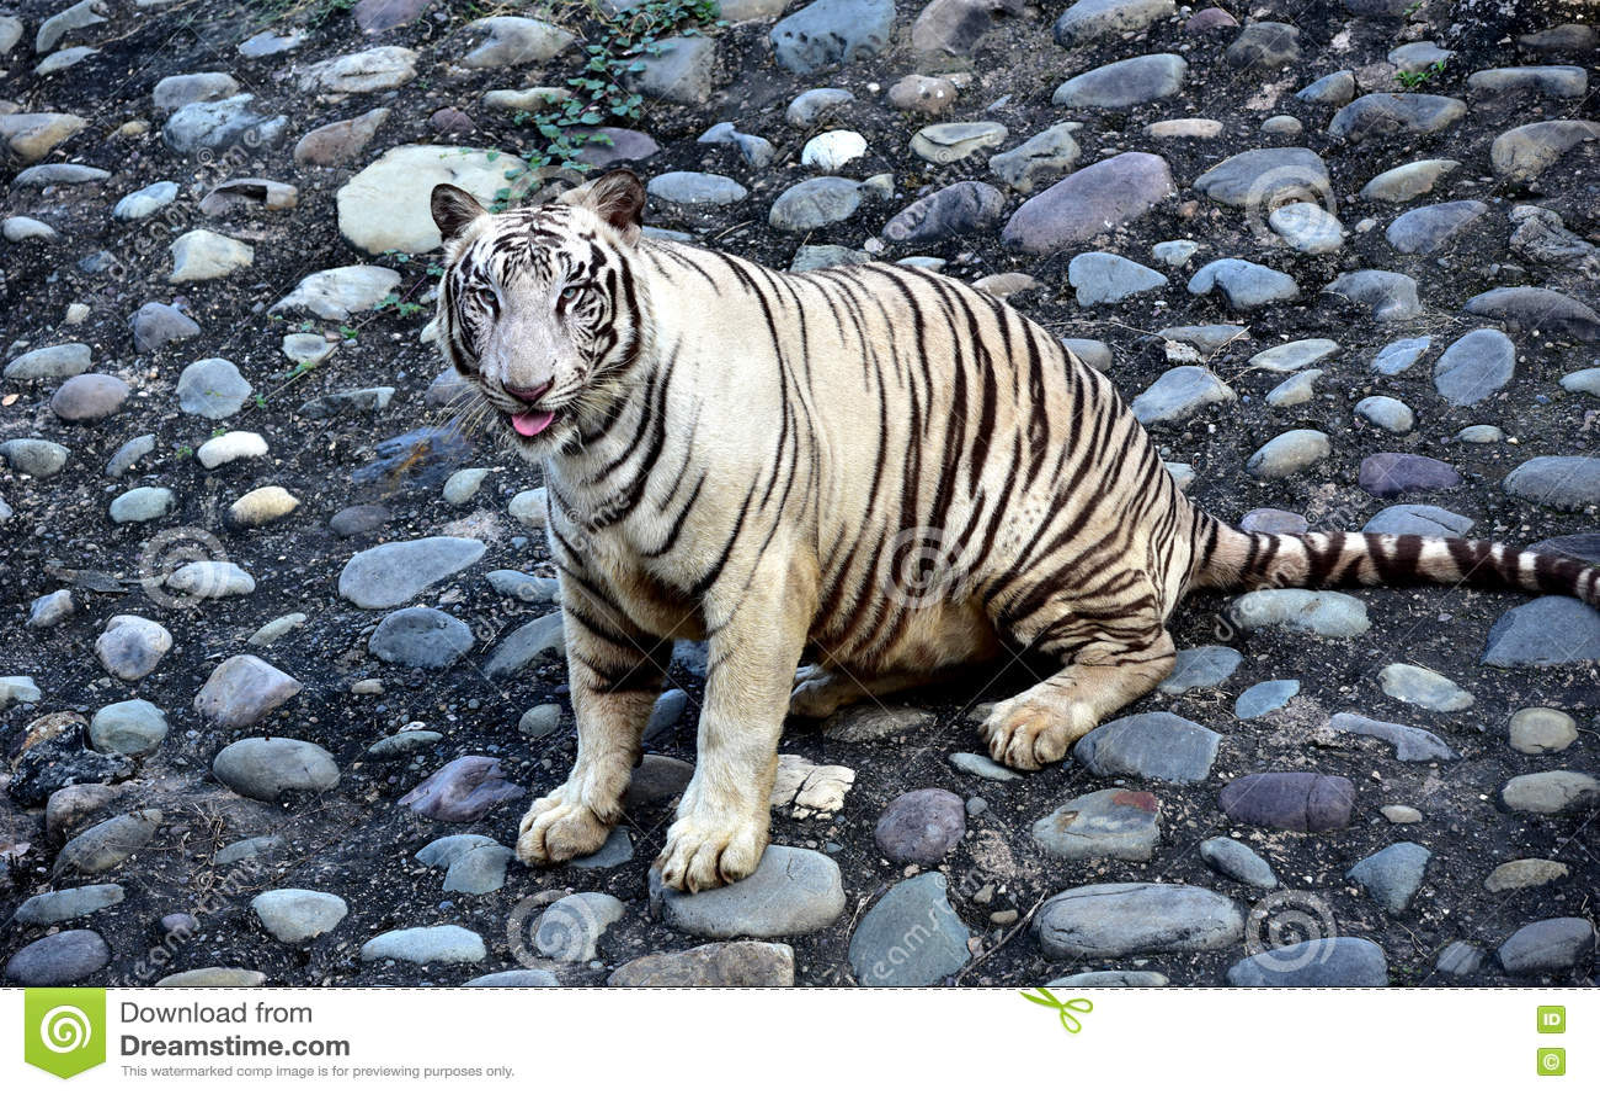 white tiger stock image image of captive tigers skin 72288843